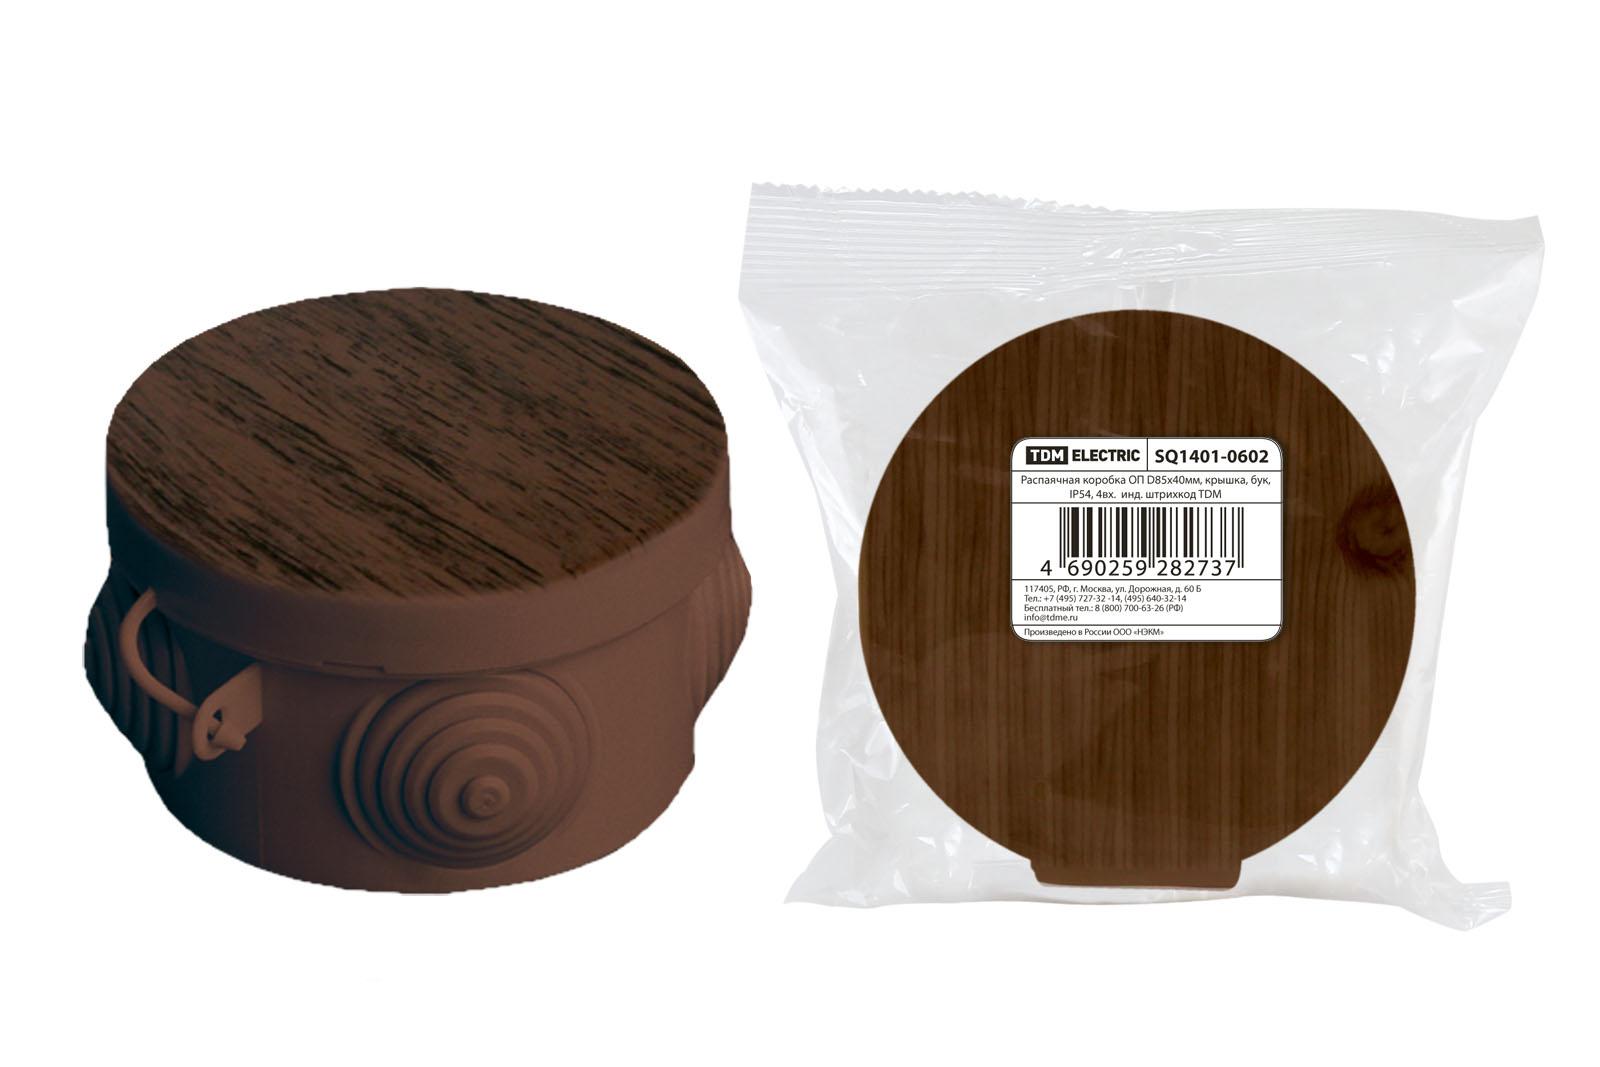 Коробка распаячная Tdm Sq1401-0602 распаячная коробка с крышкой оп 240х195х165мм ip44 кабельные ввода d28 3шт d37 2шт tdm sq1401 1273